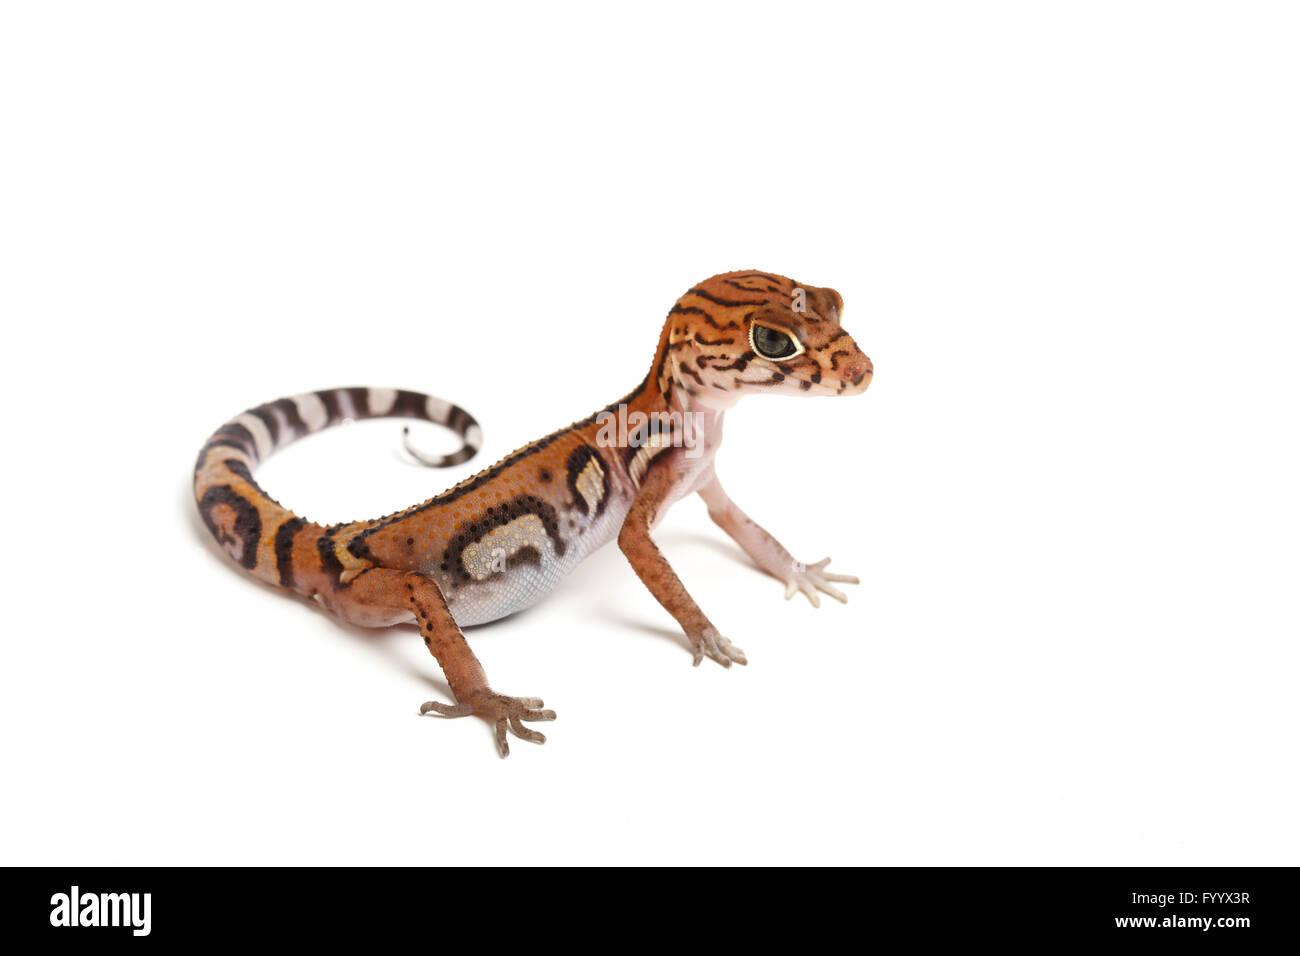 Yucatán Banded Gecko, Coleonyx elegans, adult. Central America. A member of the Eublepharidae family (captive) - Stock Image